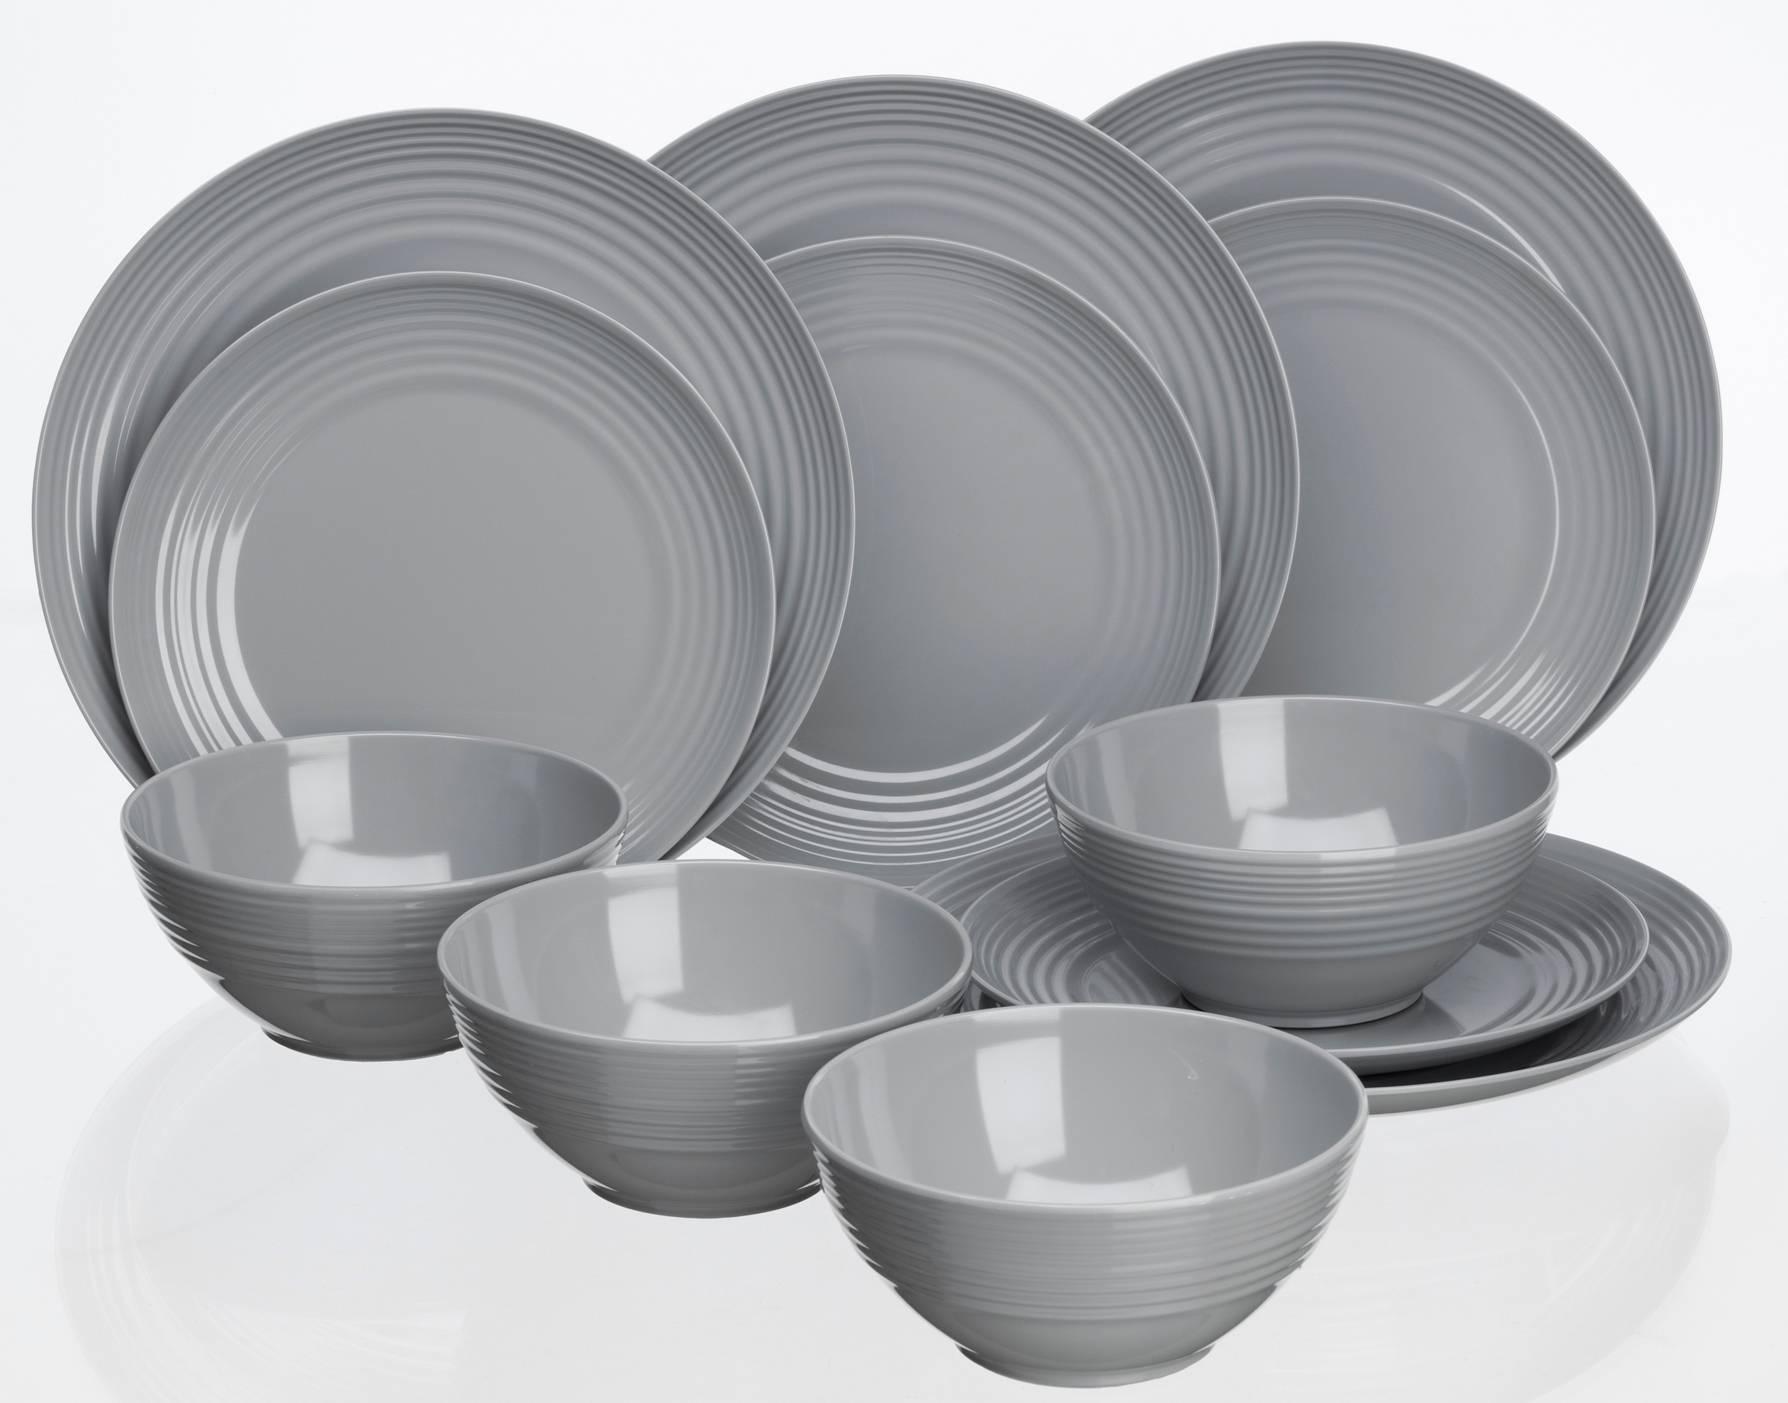 Flamefield Non Slip 12 piece Dinner Set Cool Grey Plastic Melamine